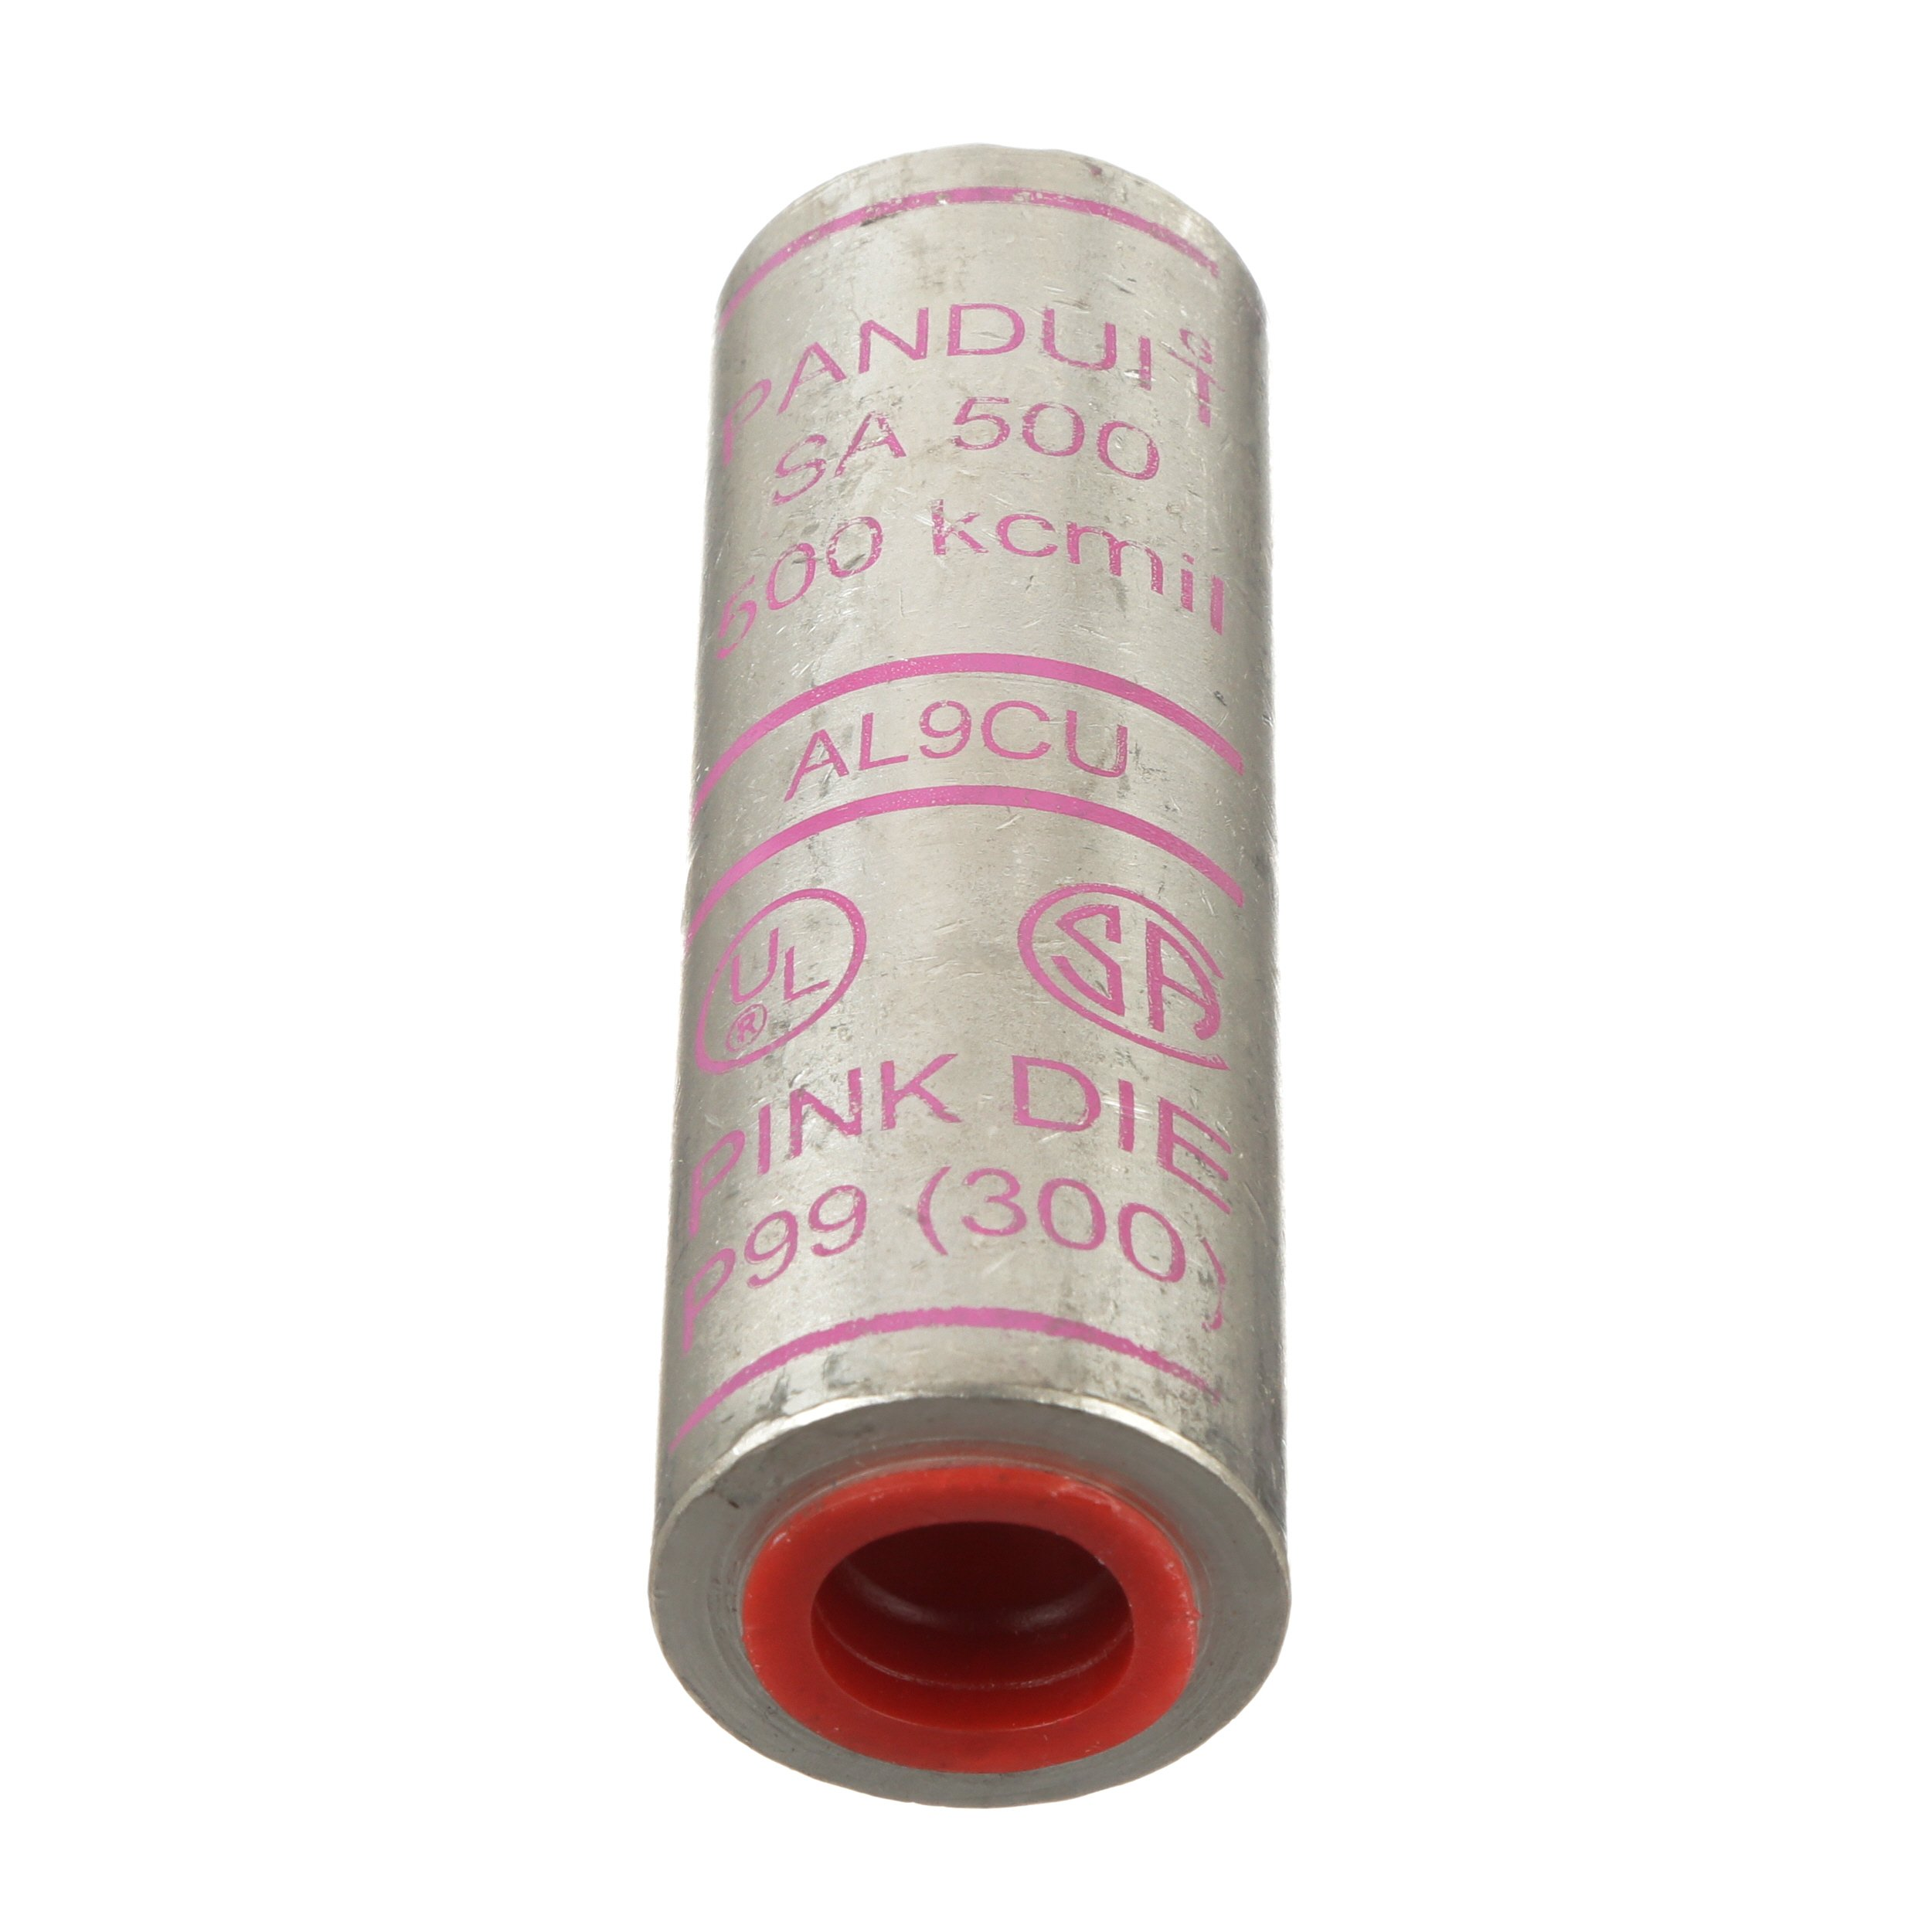 Panduit SA500-2 Barrel Code Conductor Splice, Aluminum, 500 kcmil Aluminum/Copper Conductor Size, Pink Color CBarrel ODe, 1-7/8'' Wire Strip Length, 1.32'' Barrel OD, 3.87'' Barrel Length